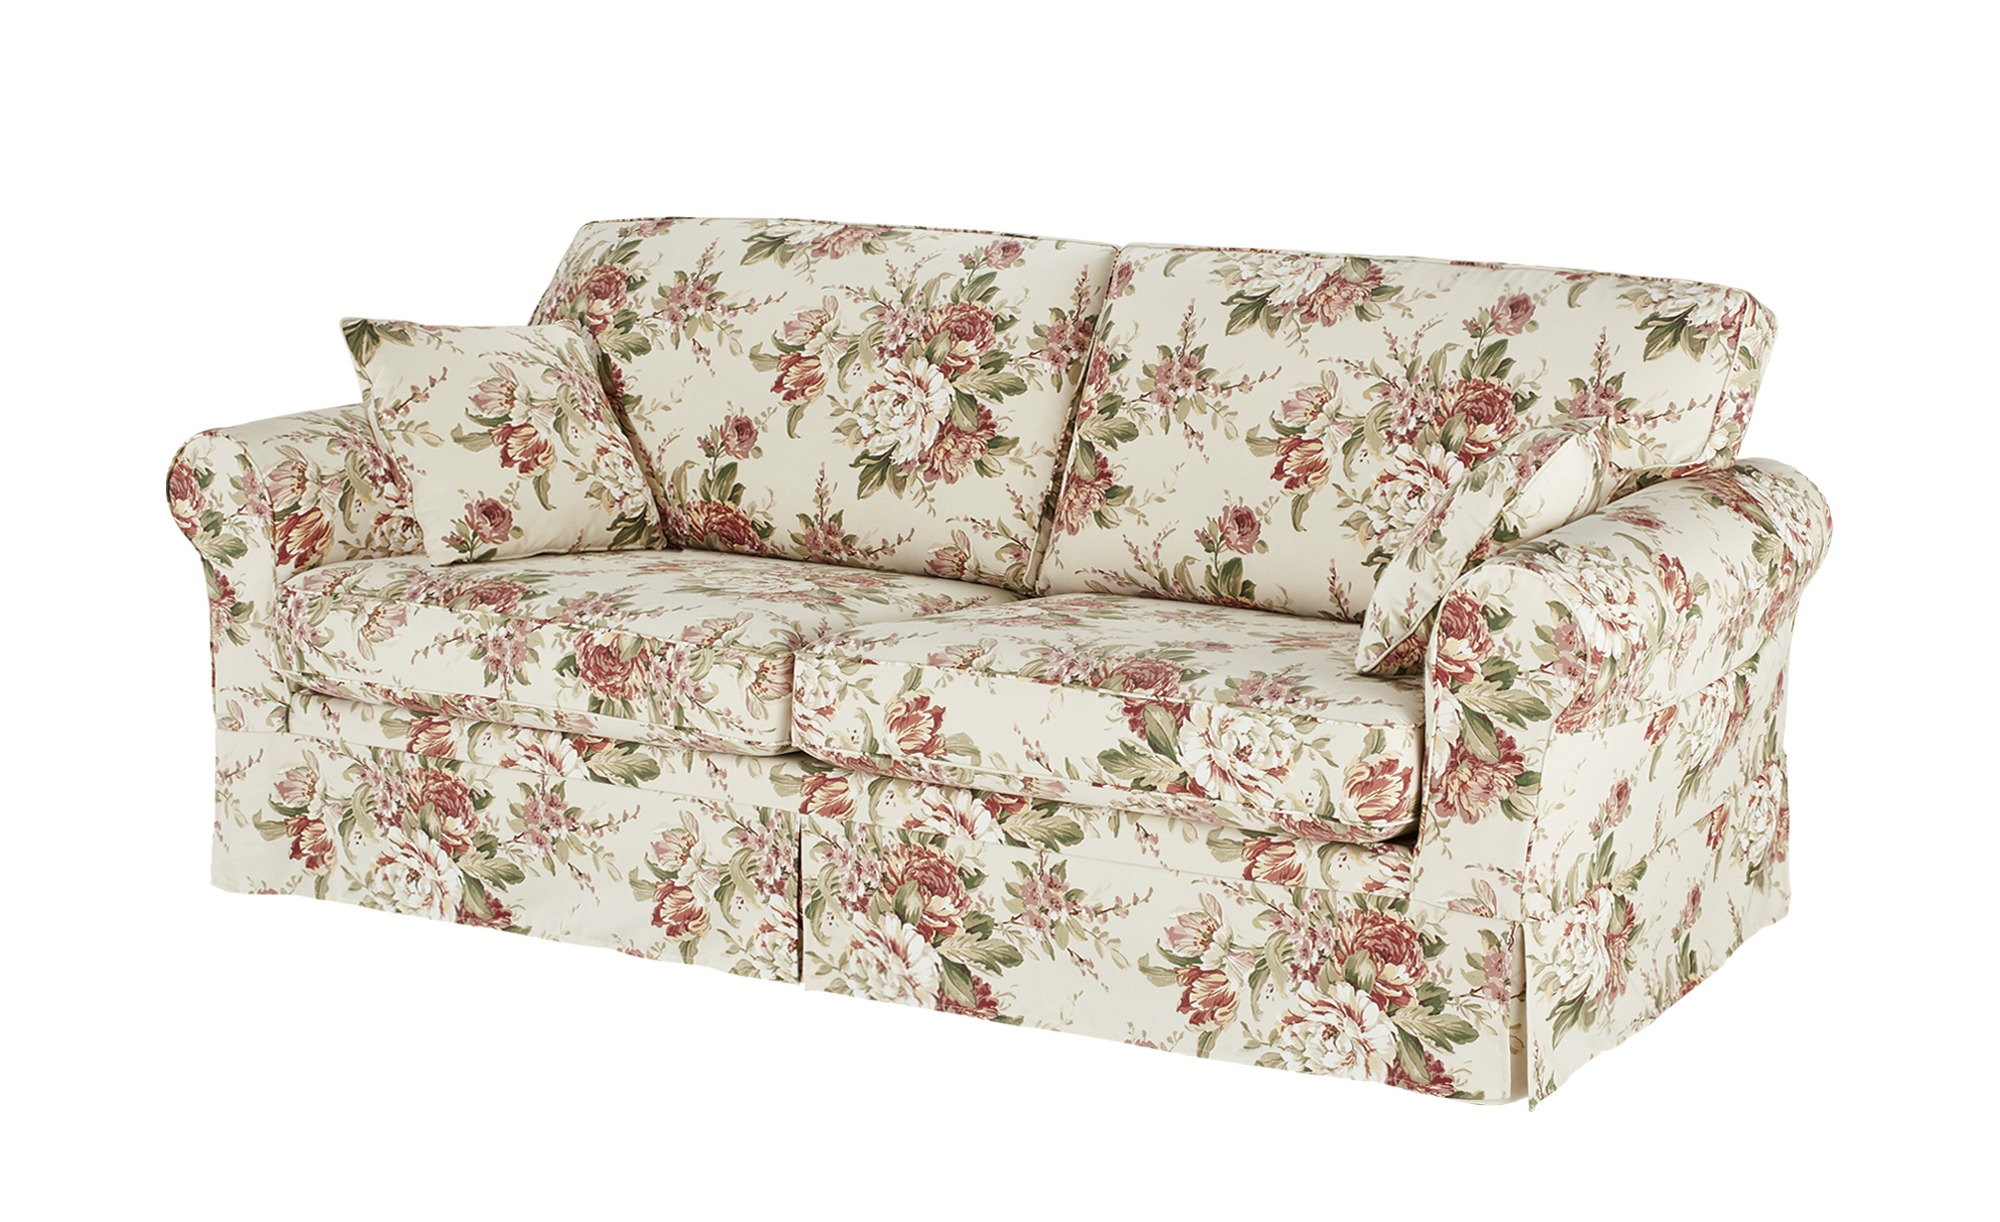 Full Size of Stretch Husse Sofa Mit Ottomane Ikea Hussen Bezug Waschbar Ecksofa Links Couch L Form Rechts Hochwertig 3 Sitzig Creme Rosa Webstoff Chaneel Himolla Altes Sofa Husse Sofa